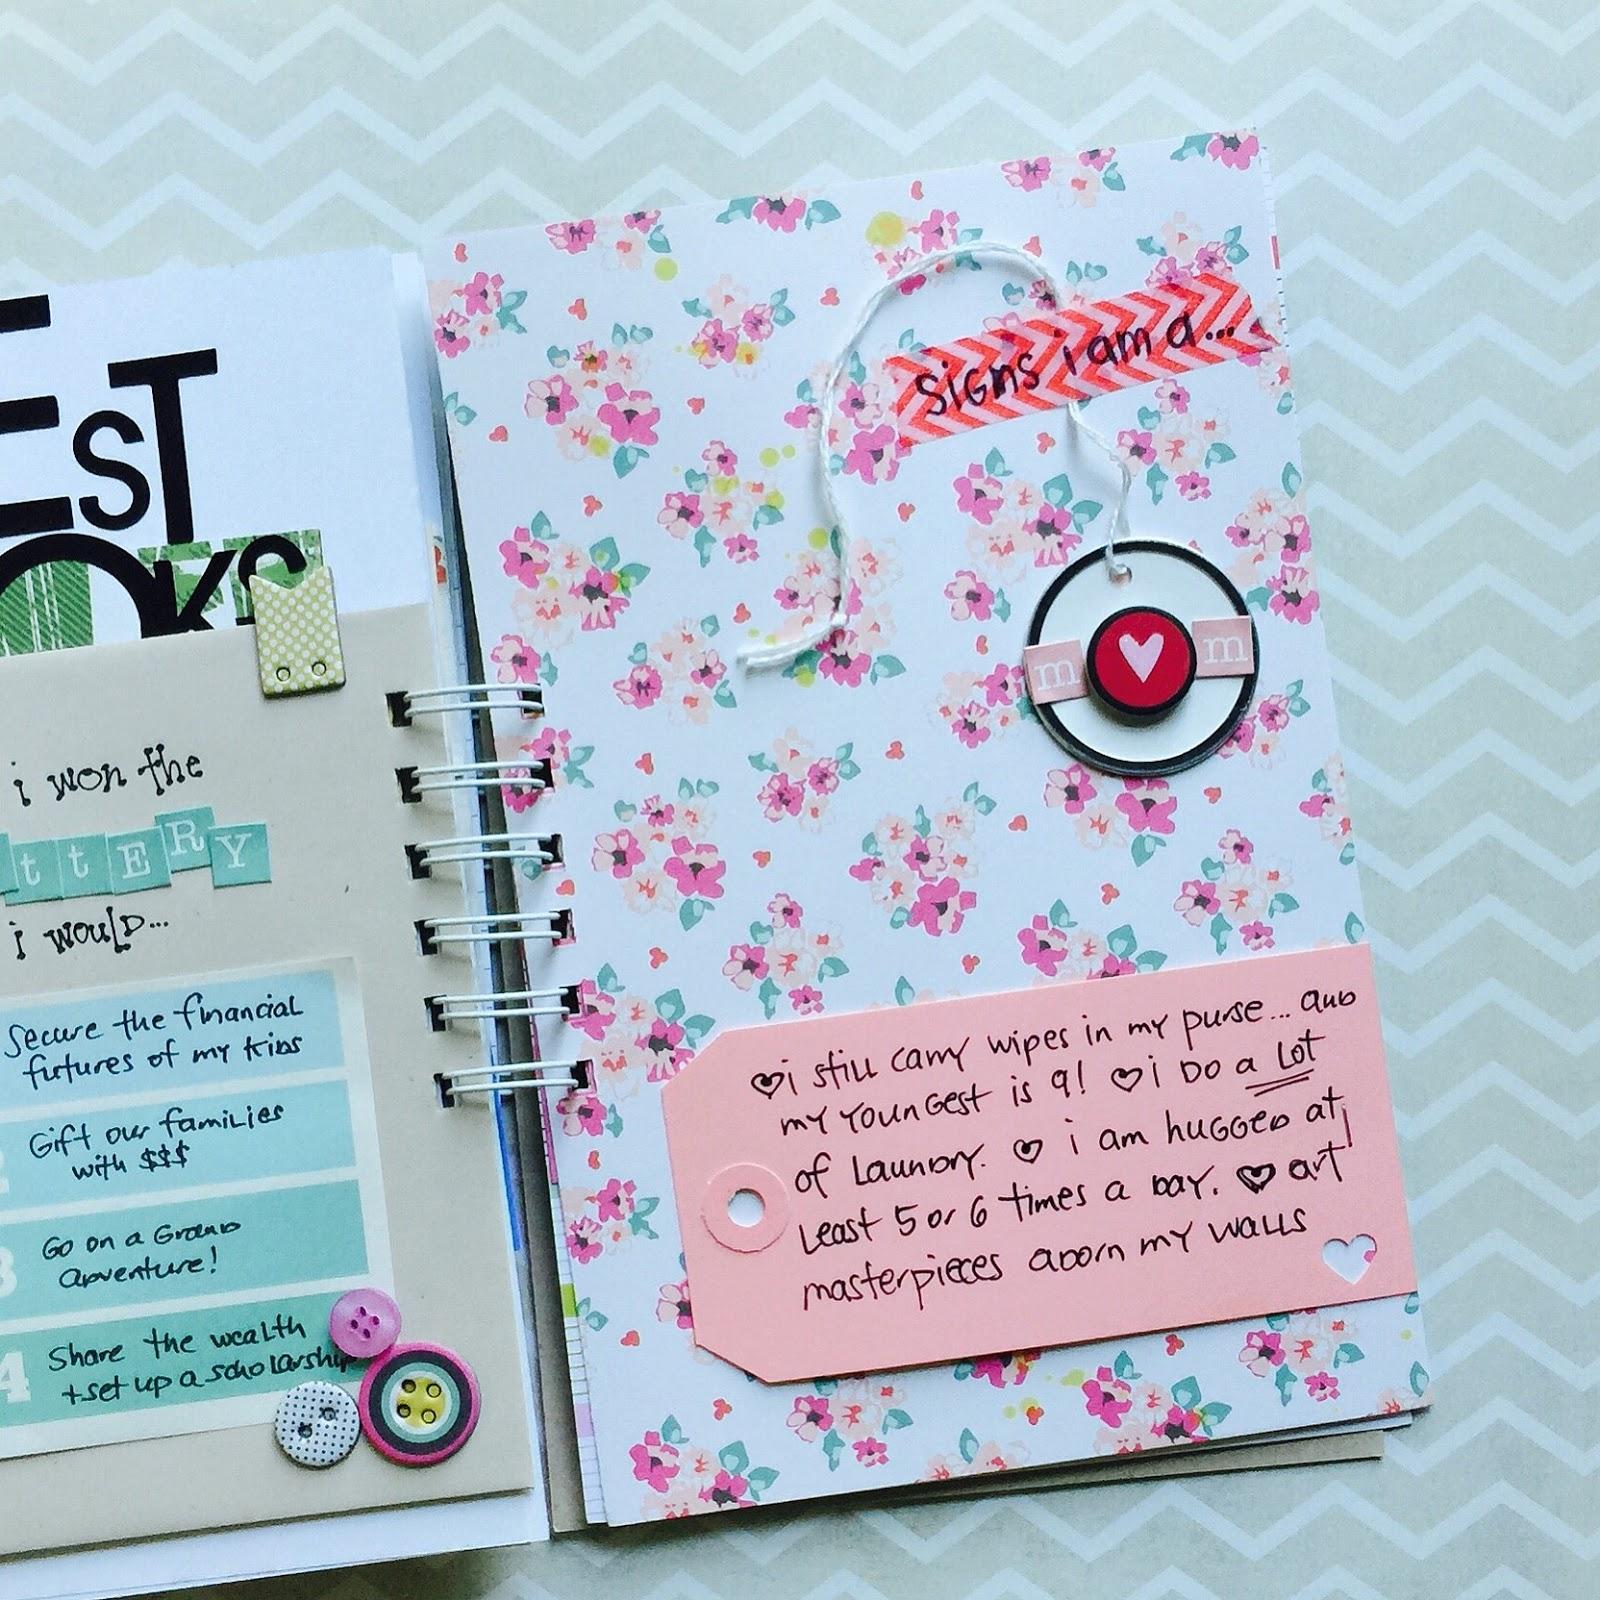 #smashbook #mixedmedia #journaling #lists #mini album #mom